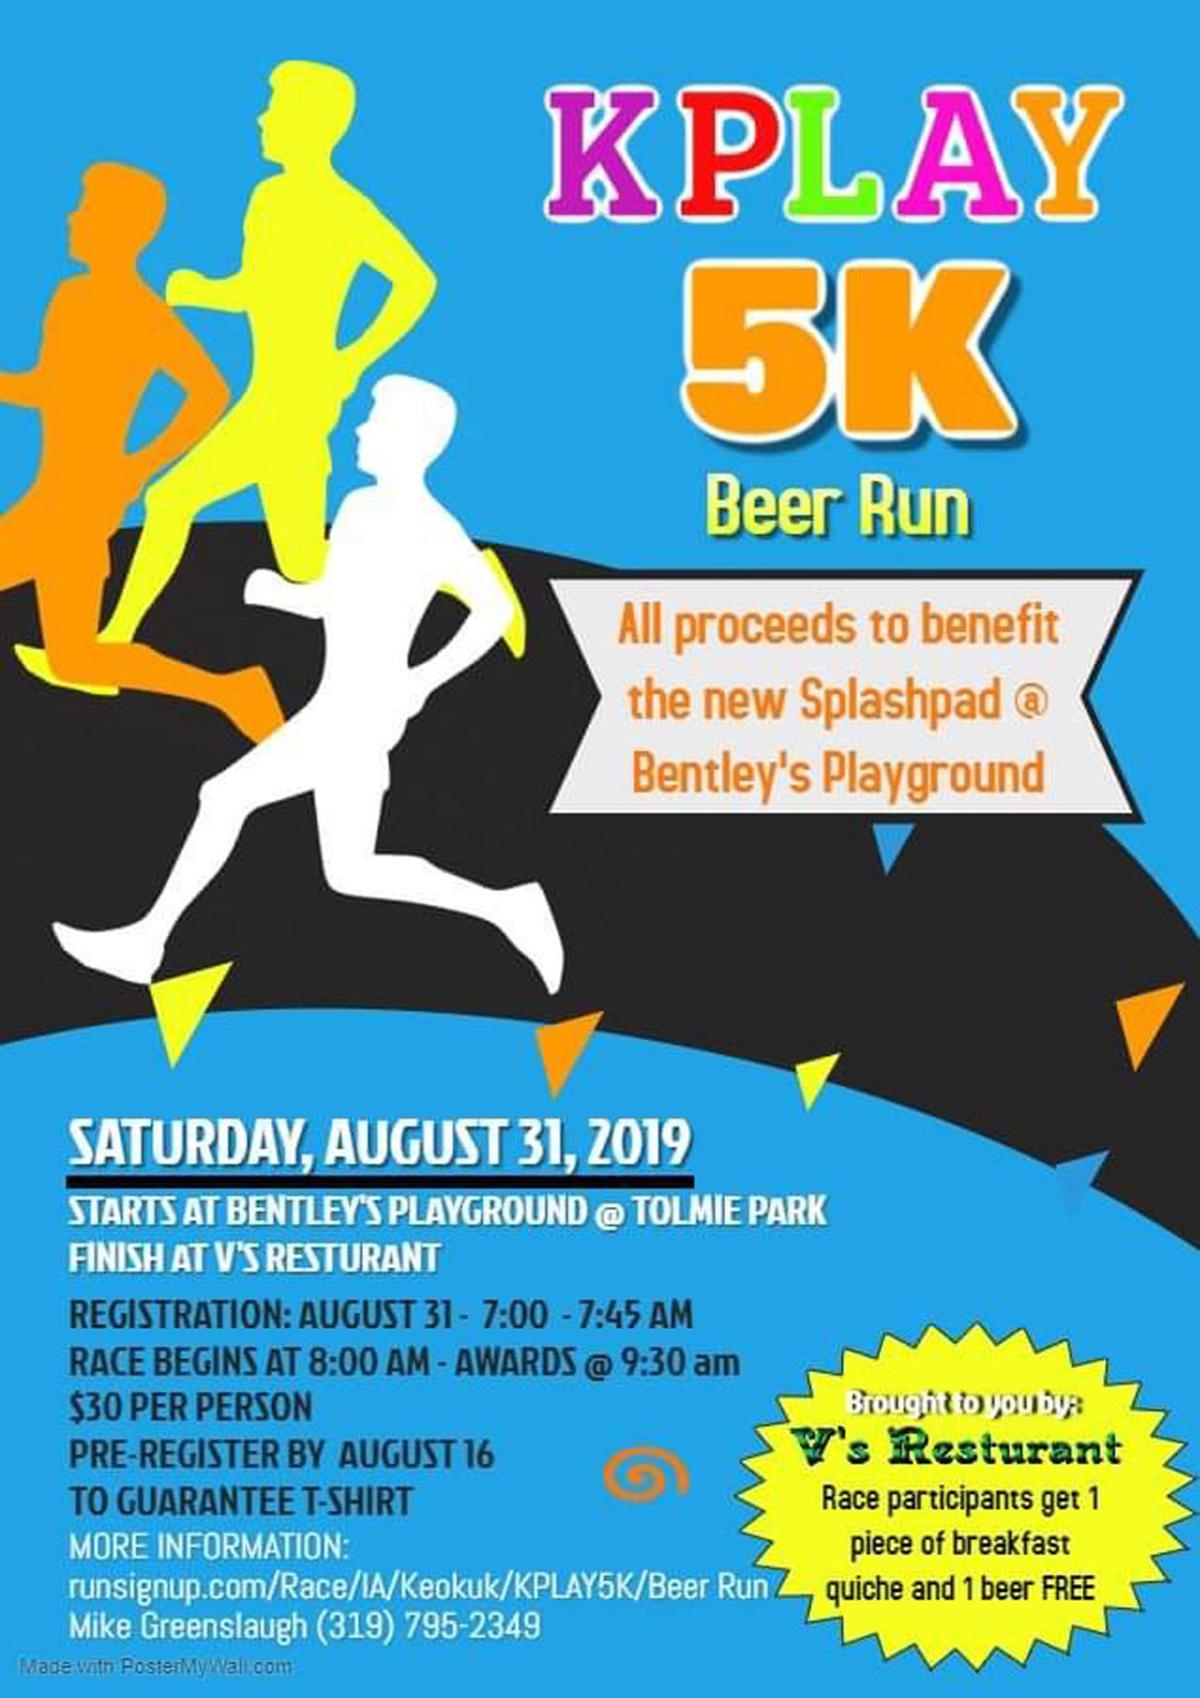 KPlay 5K Beer run poster